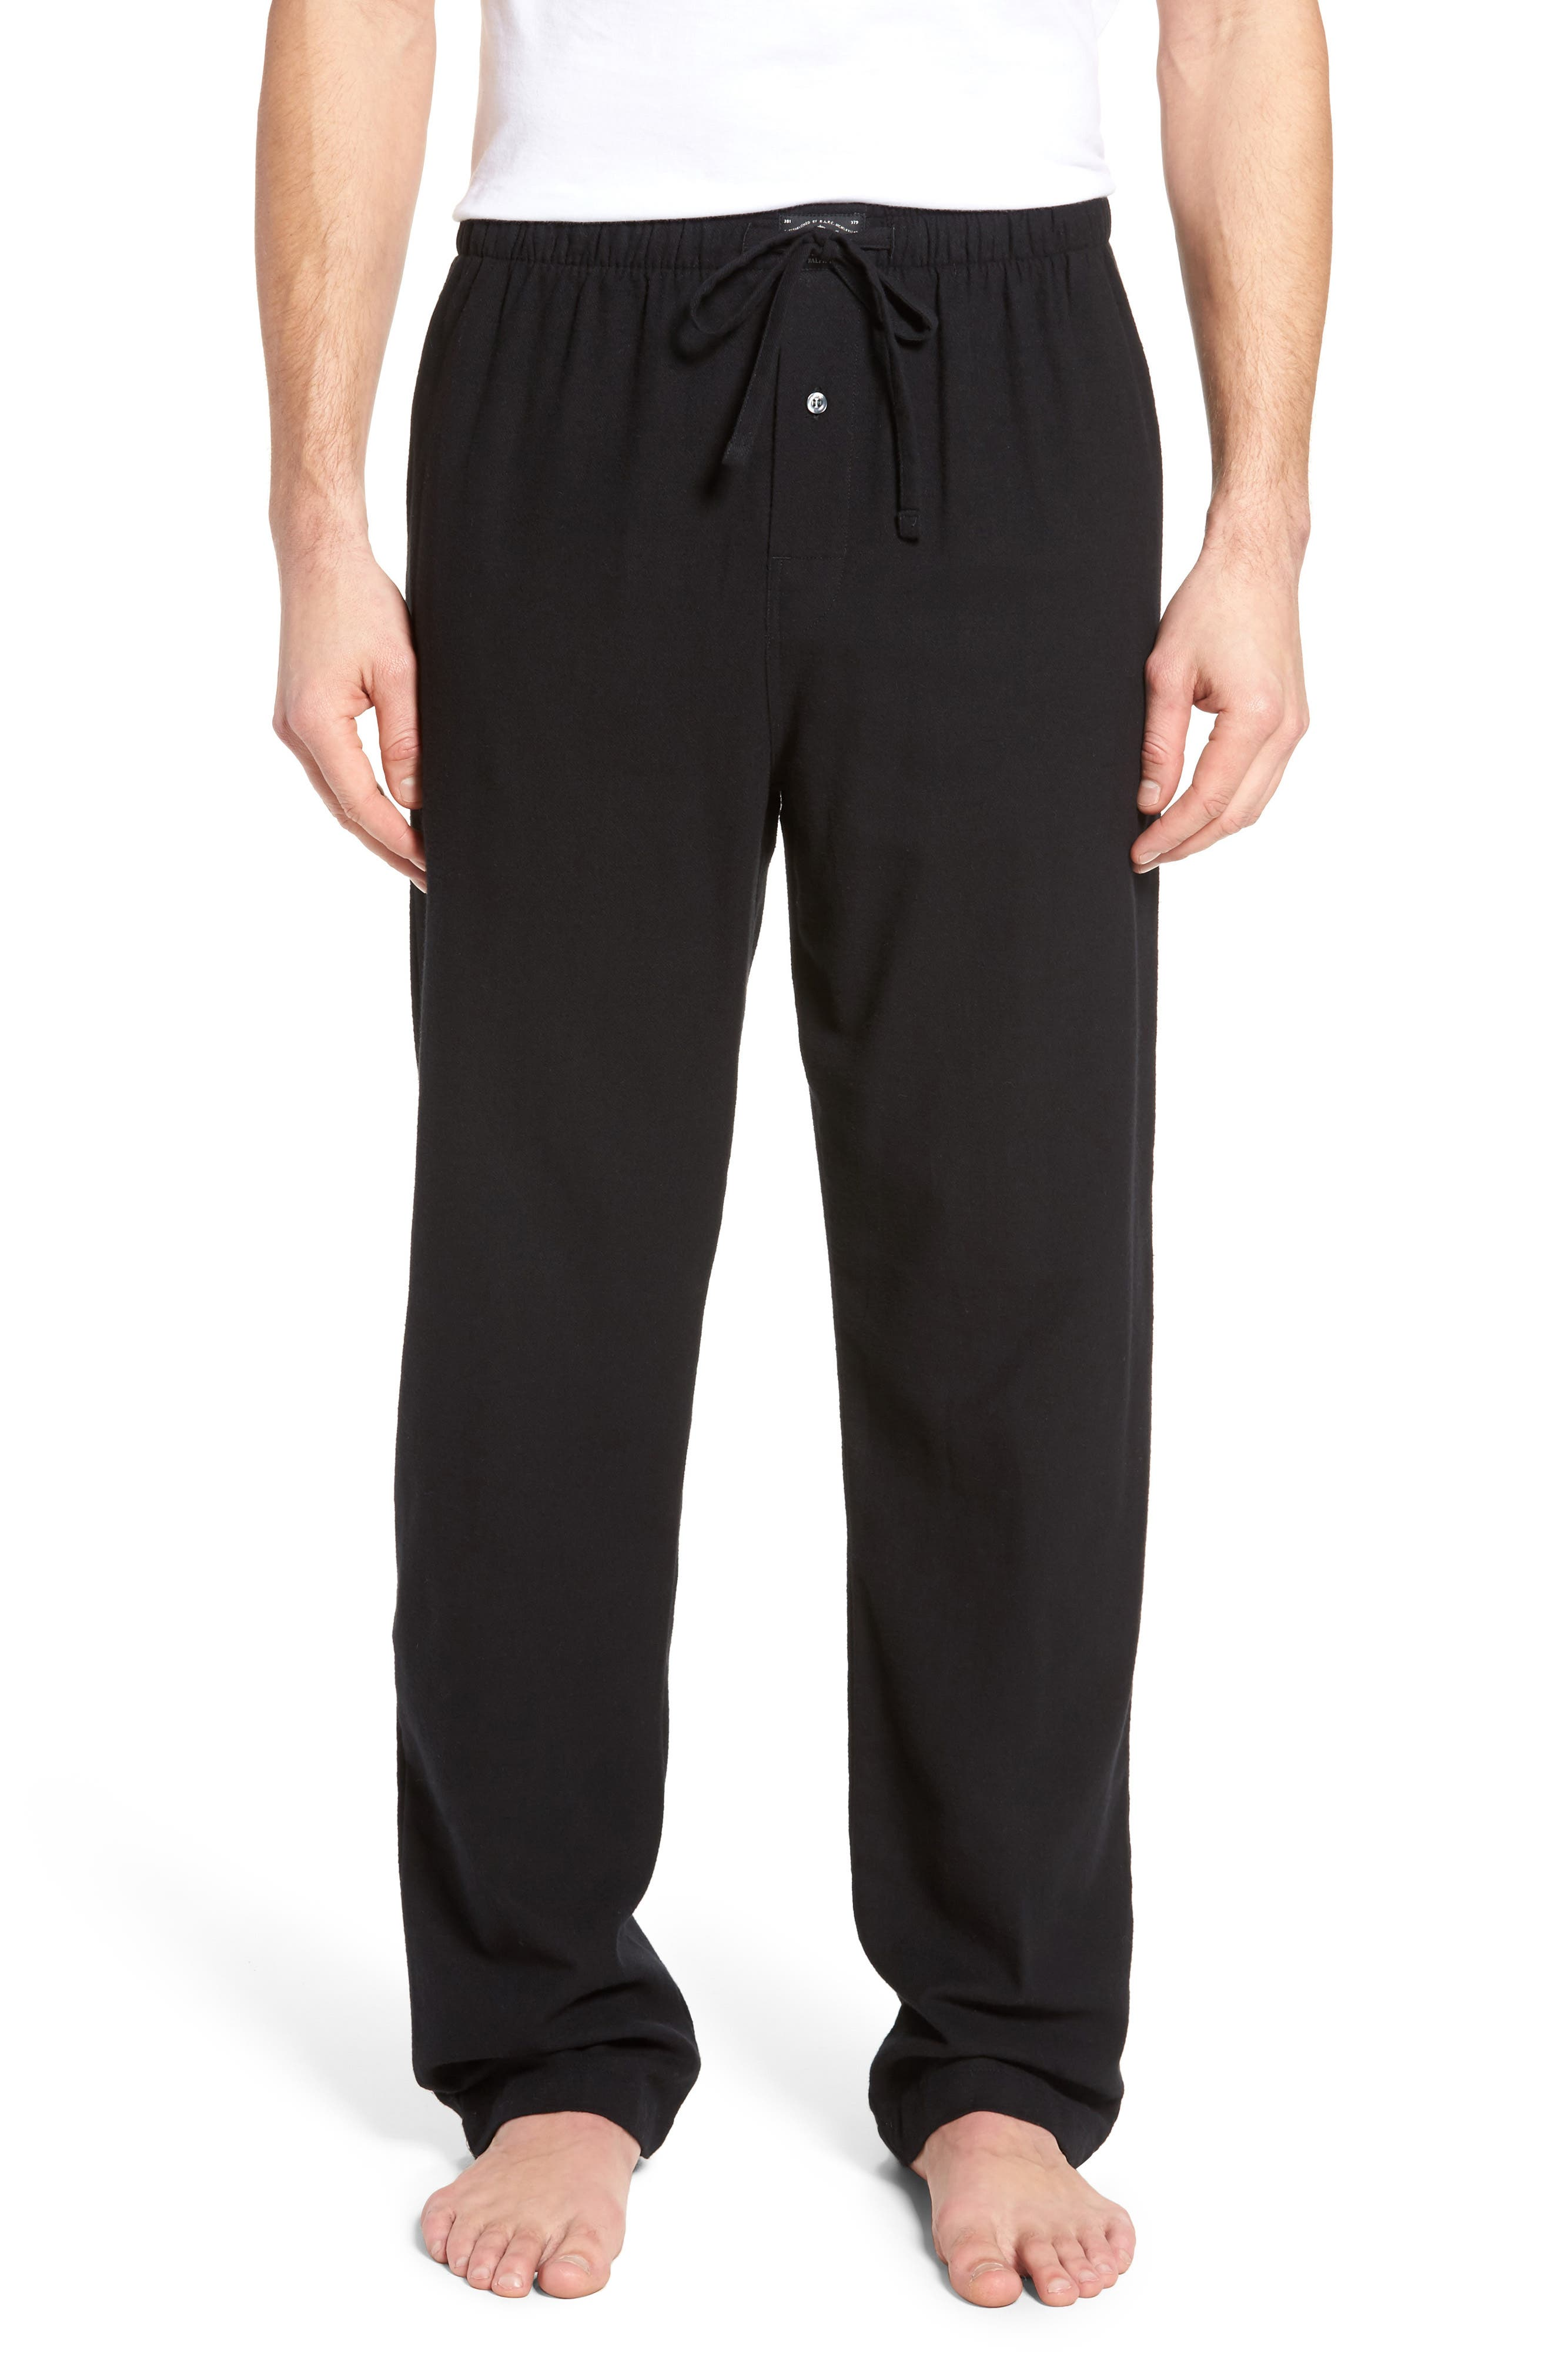 Flannel Pajama Pants,                             Main thumbnail 1, color,                             001